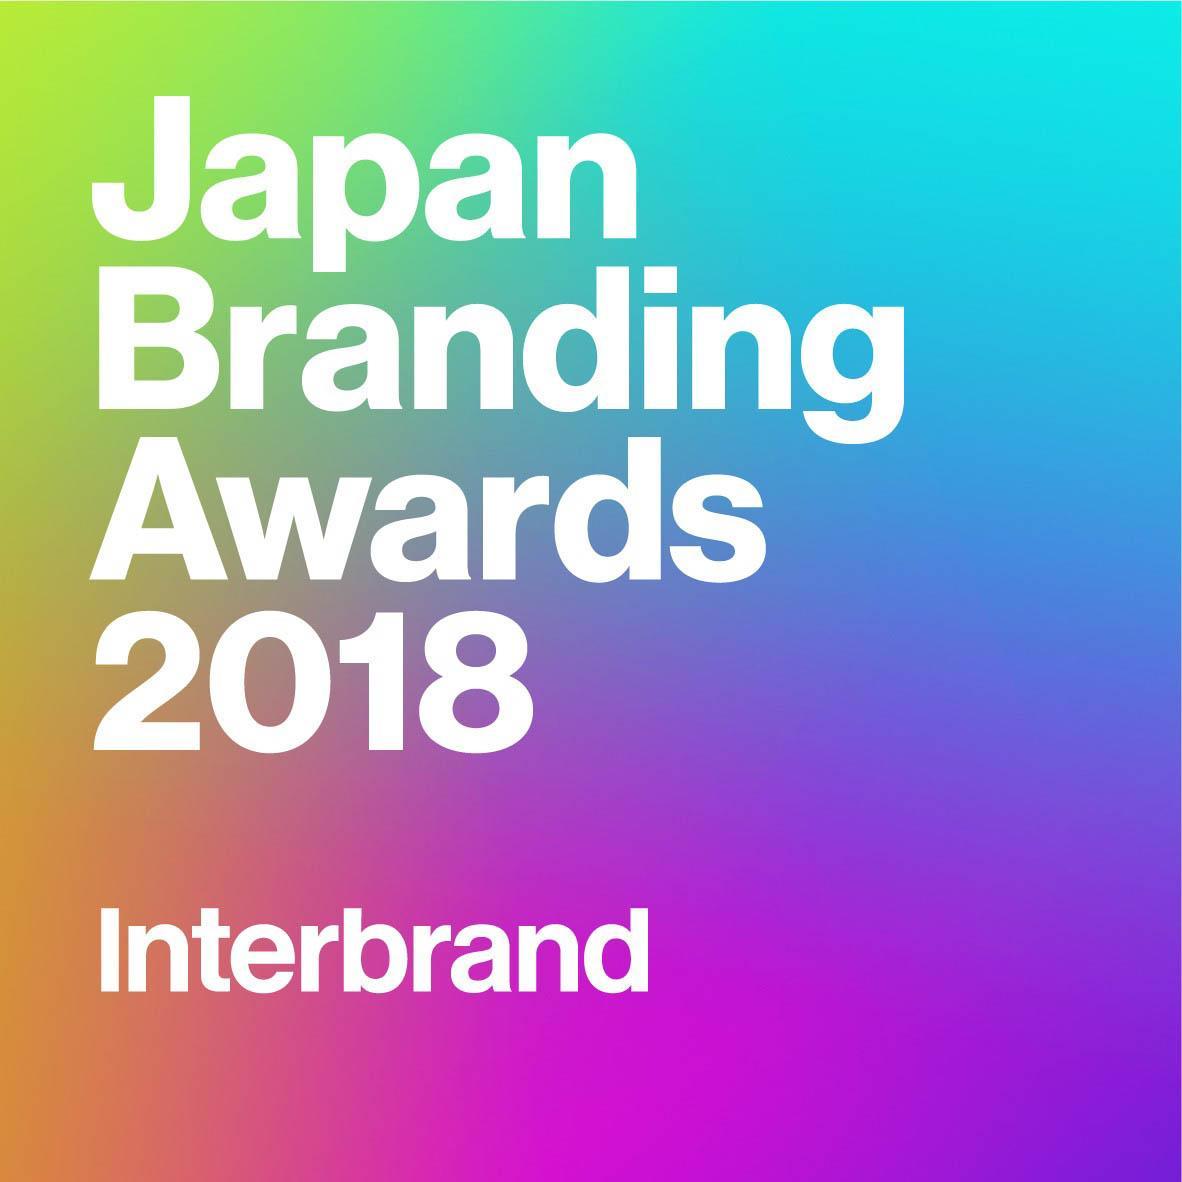 image: The Japan Branding Awards 2018 award logo